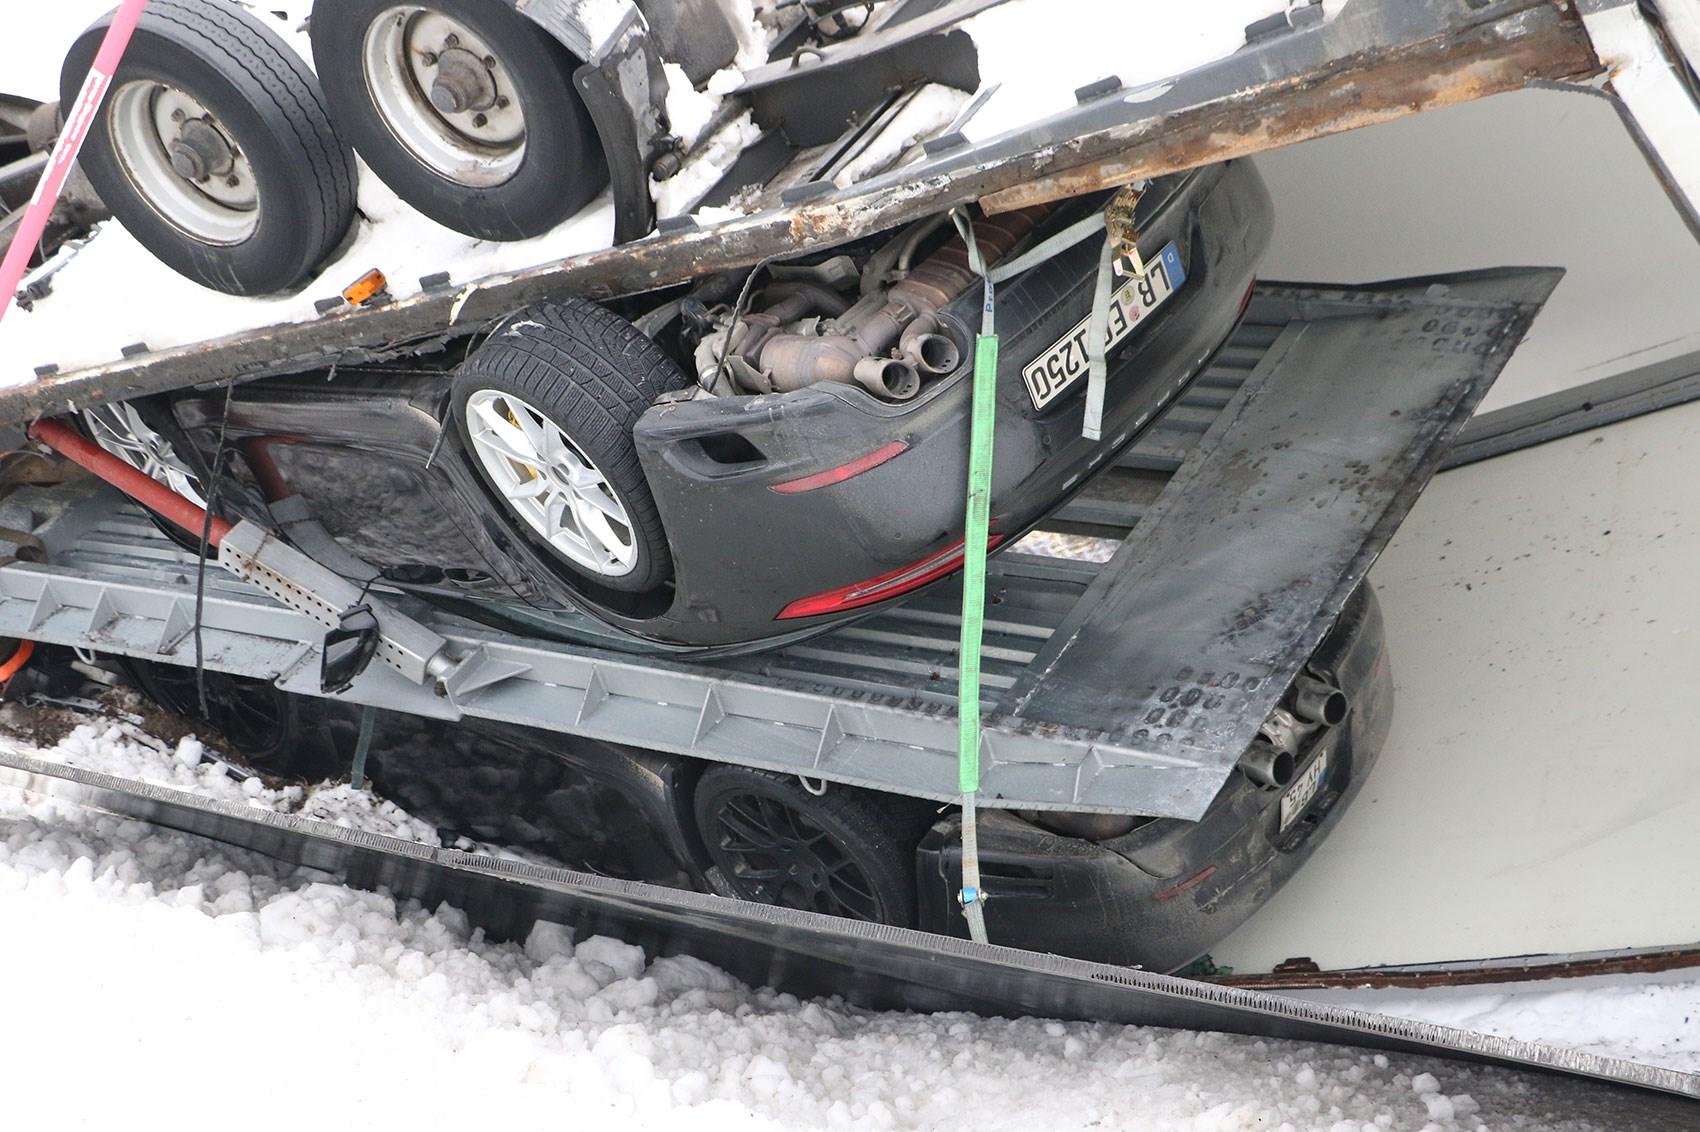 Porsche prototype prang: a transporter spills its secret stash on winter test | CAR Magazine